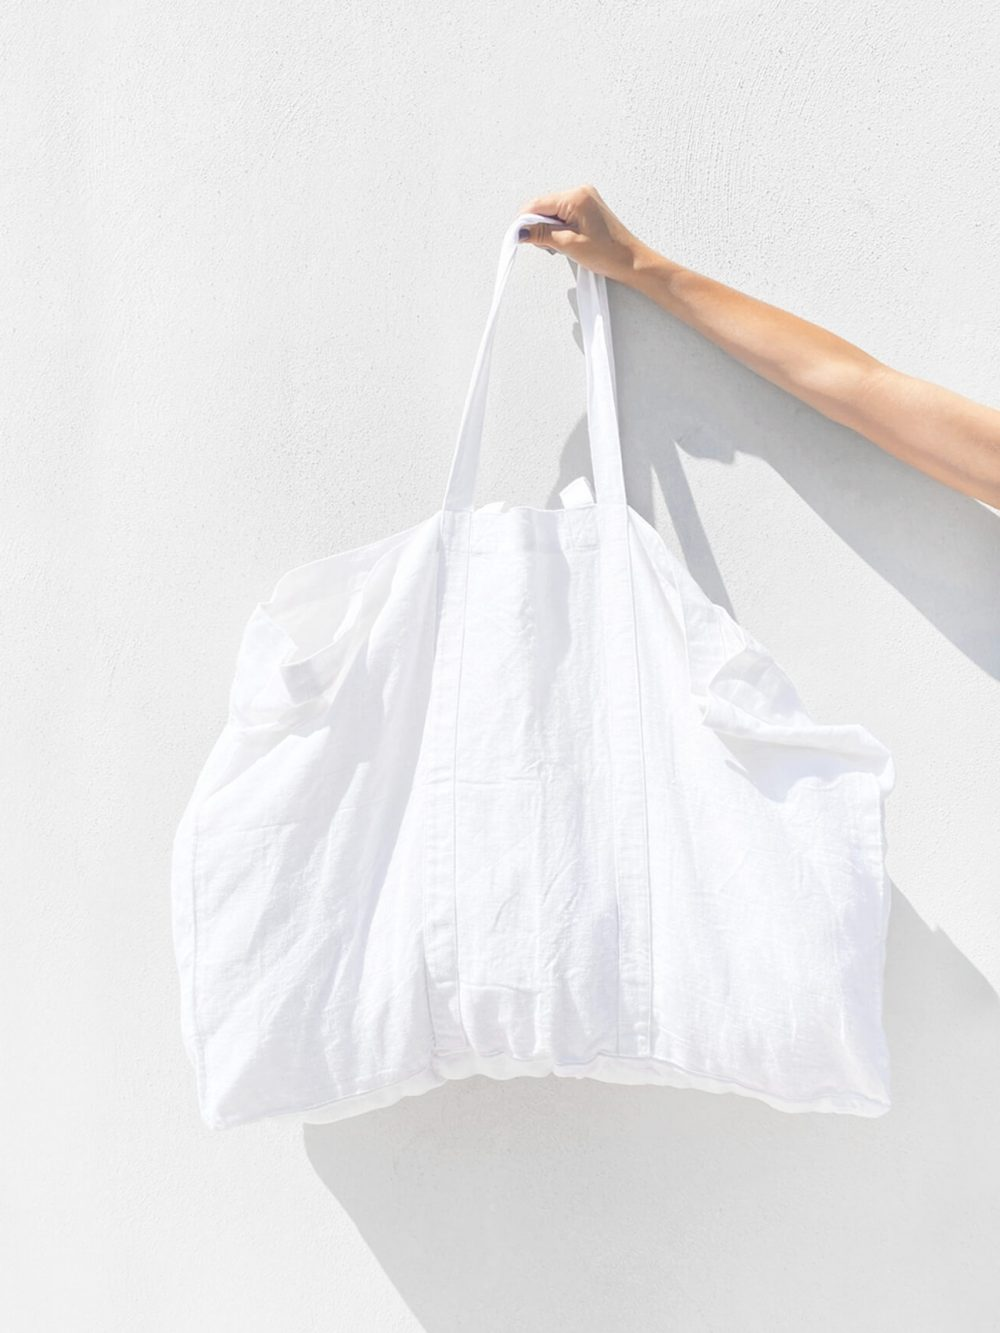 Sac de plage vegan blanc en lin français de la marque comptoir des teintures Made in France